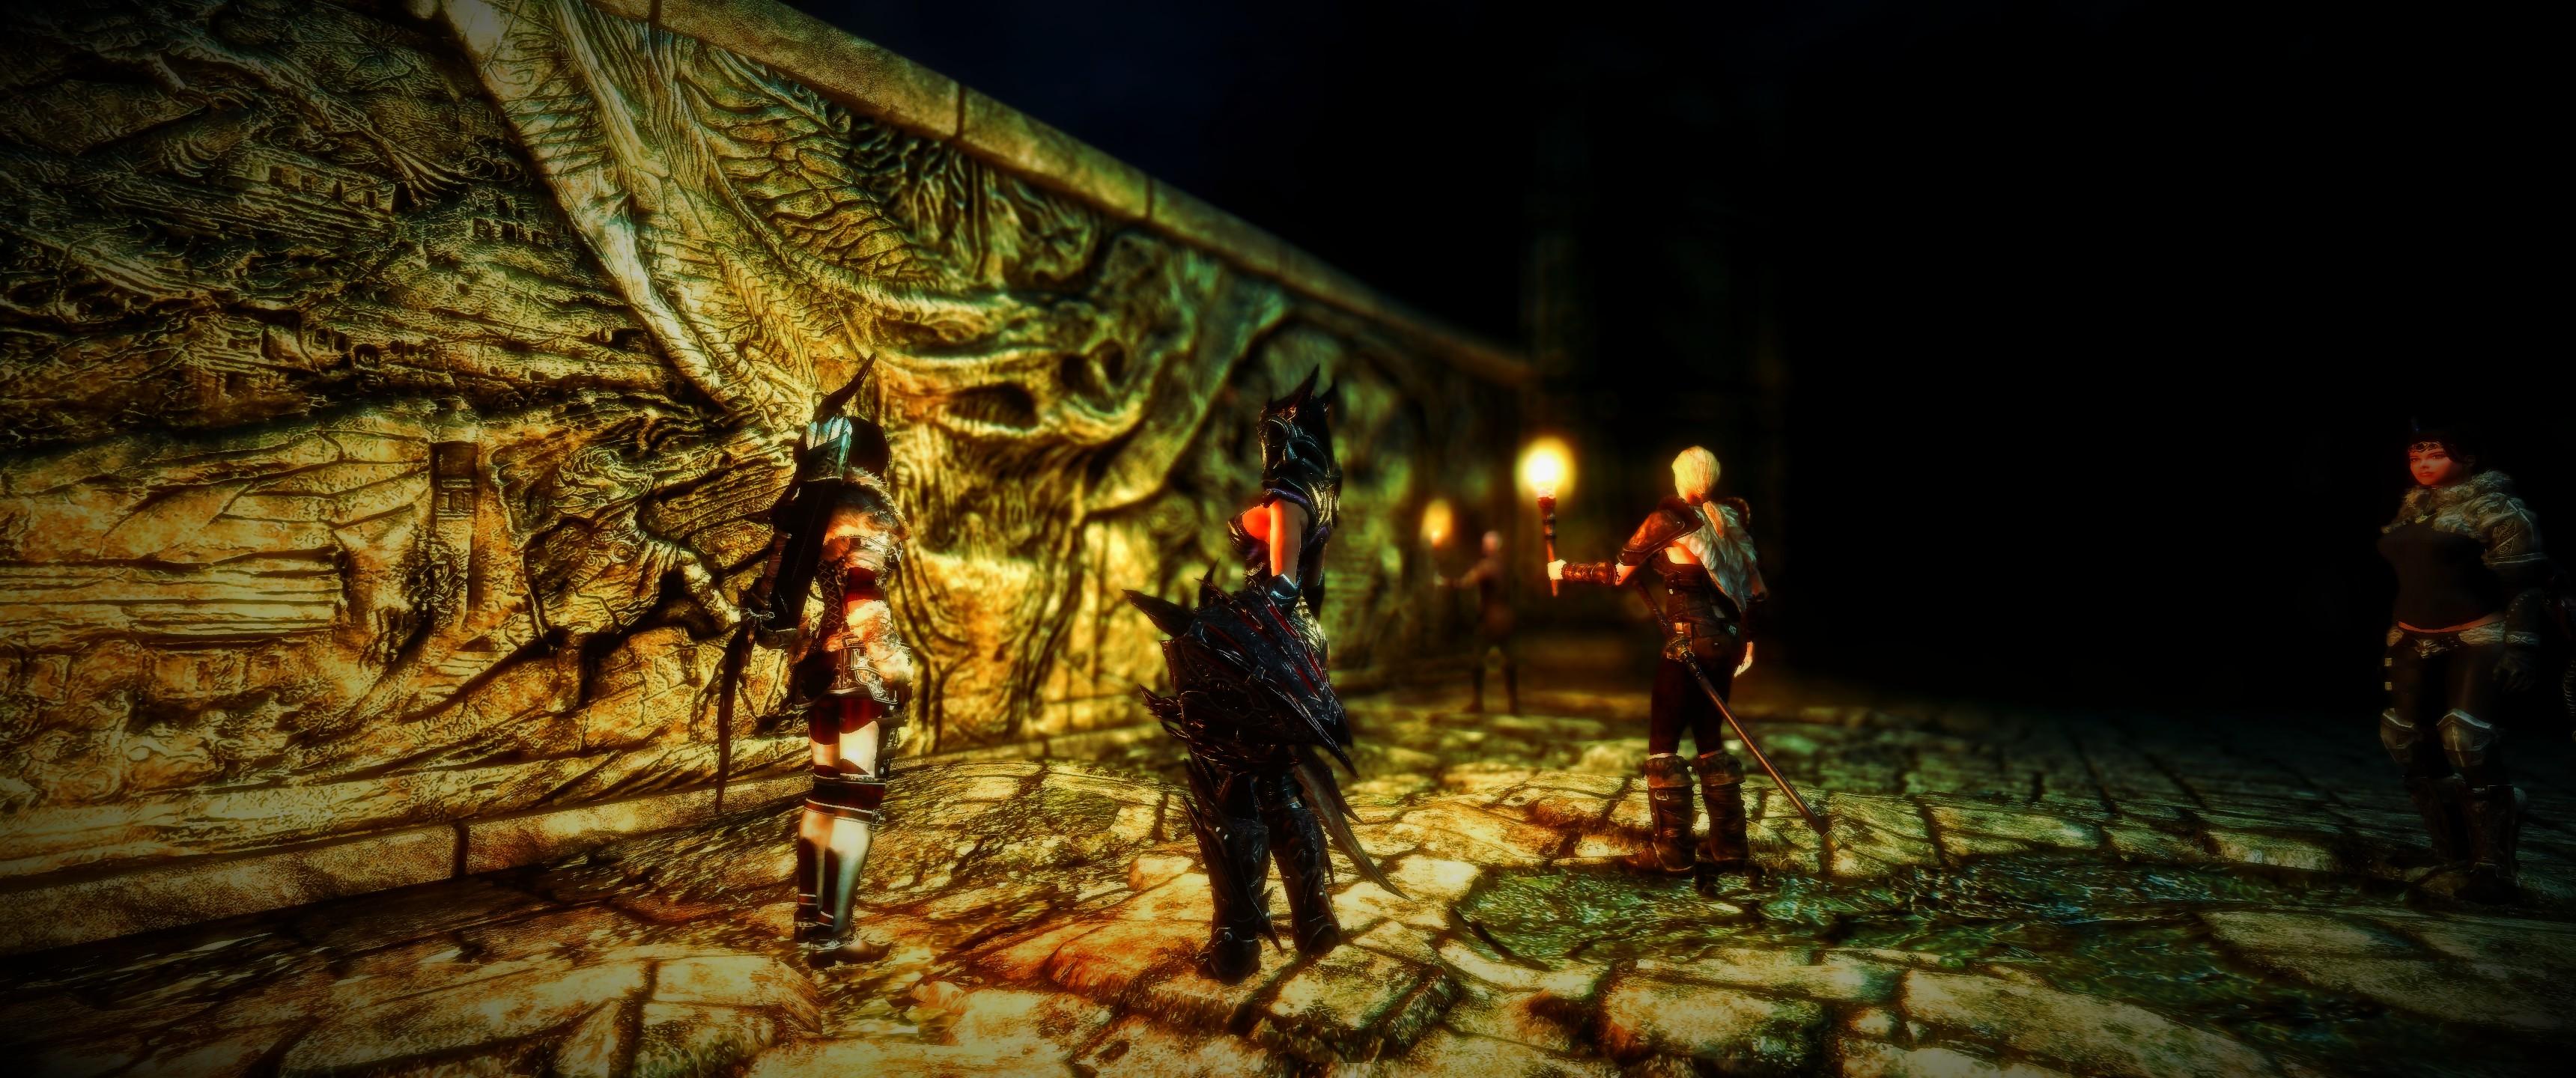 20171218092315_1.jpg - Elder Scrolls 5: Skyrim, the